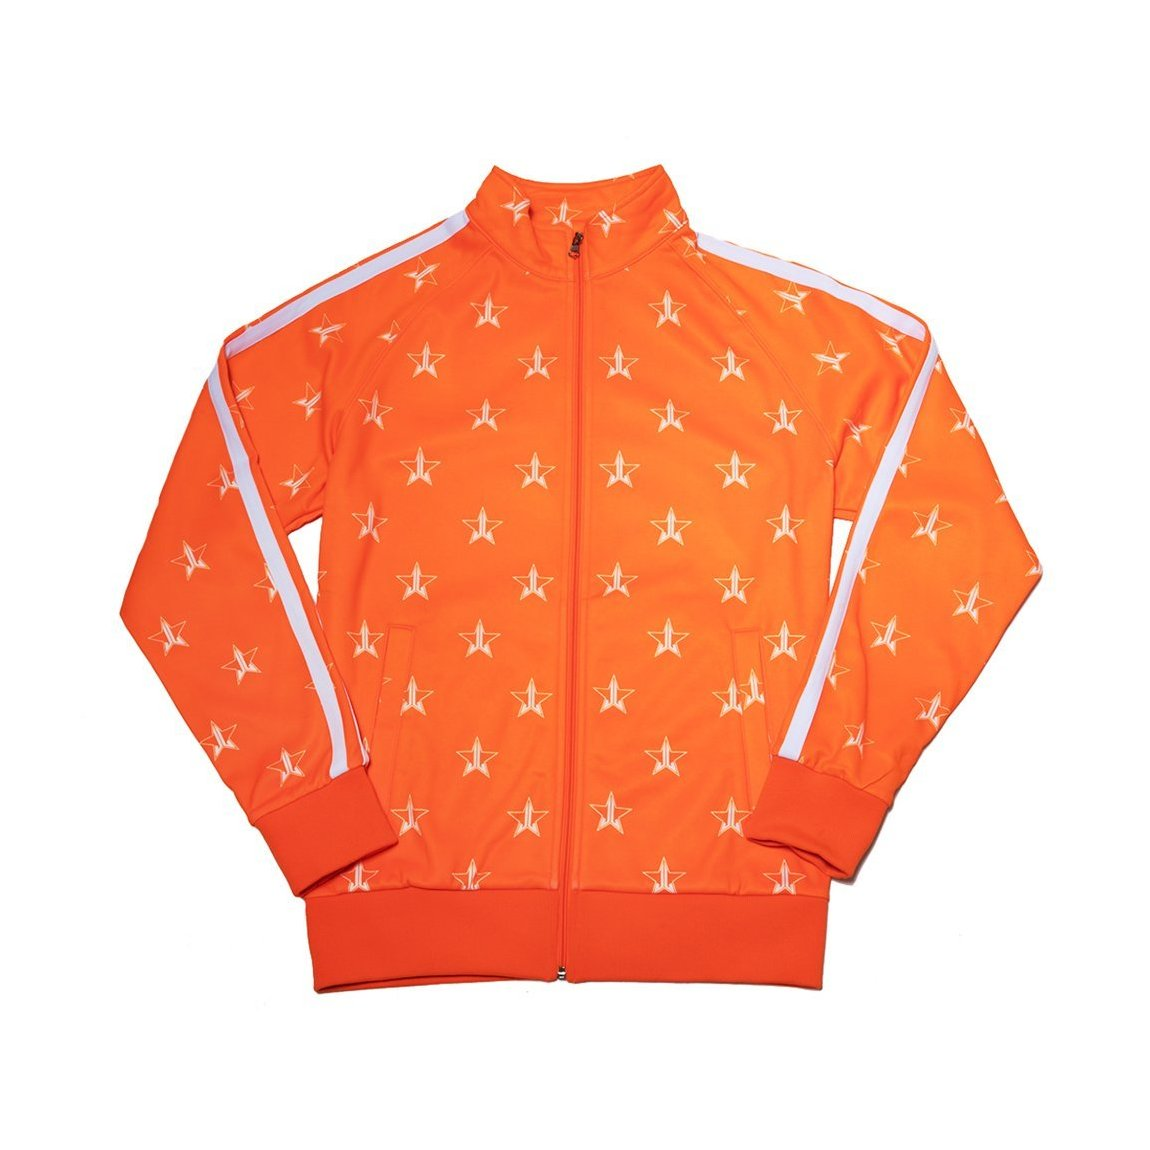 Jeffree Star Cosmetics Safety Orange Track Jacket Small product swatch.